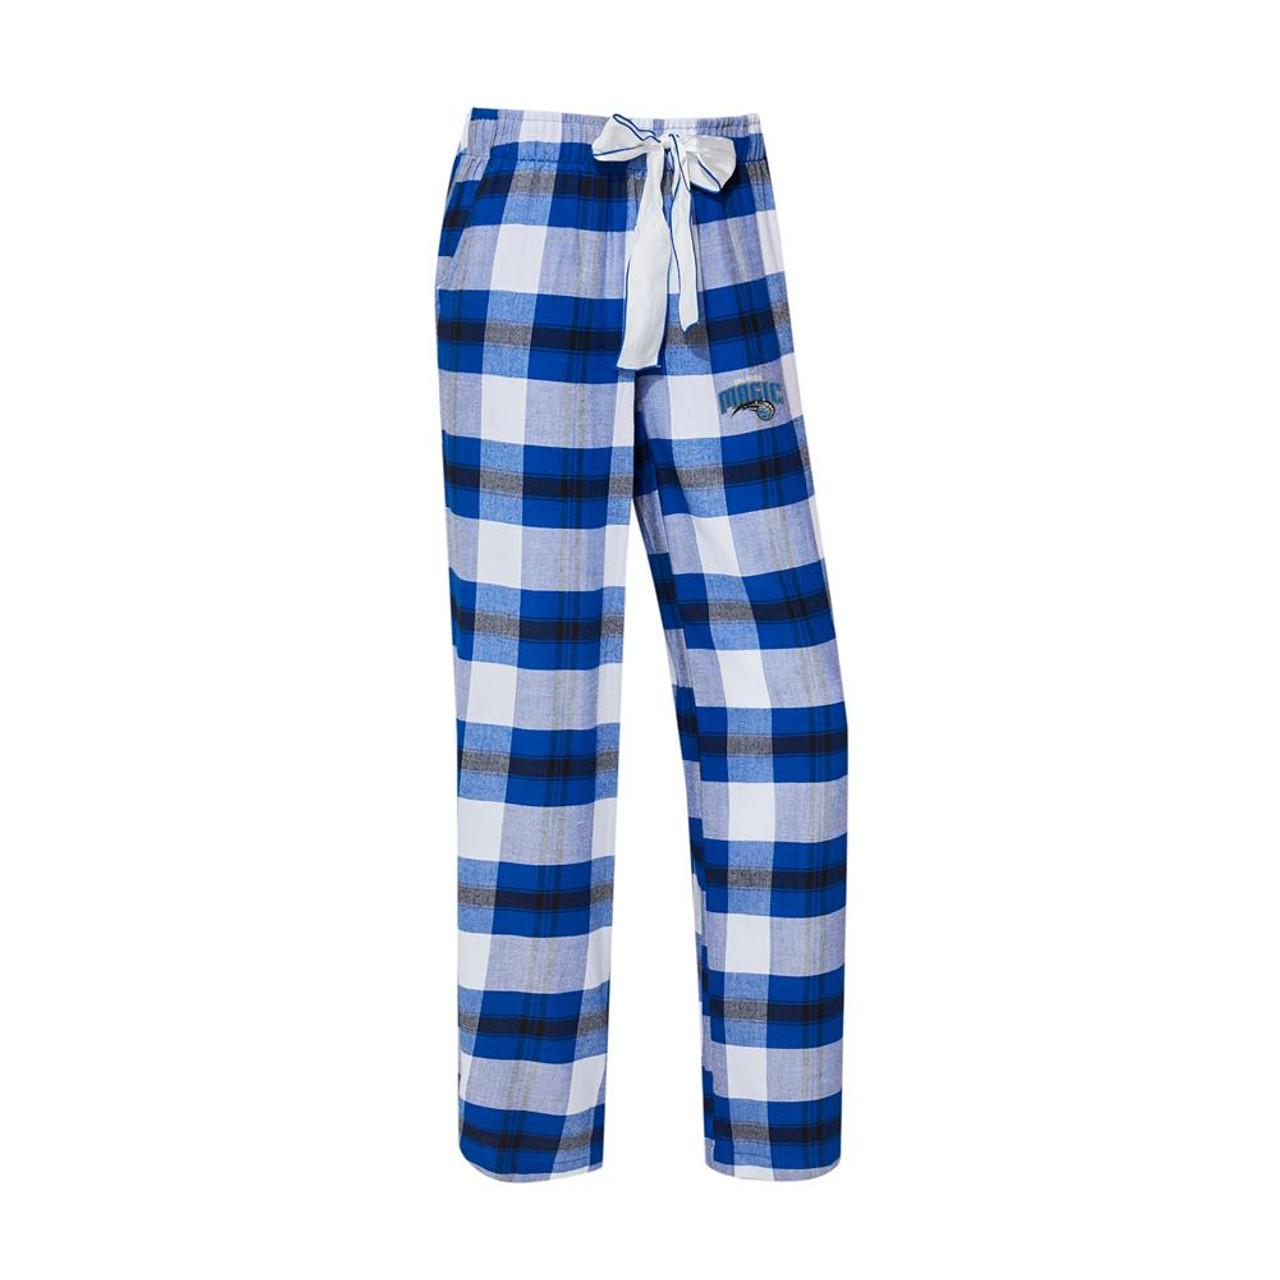 Orlando Magic Women's Flannel Pajamas Plaid PJ Bottoms